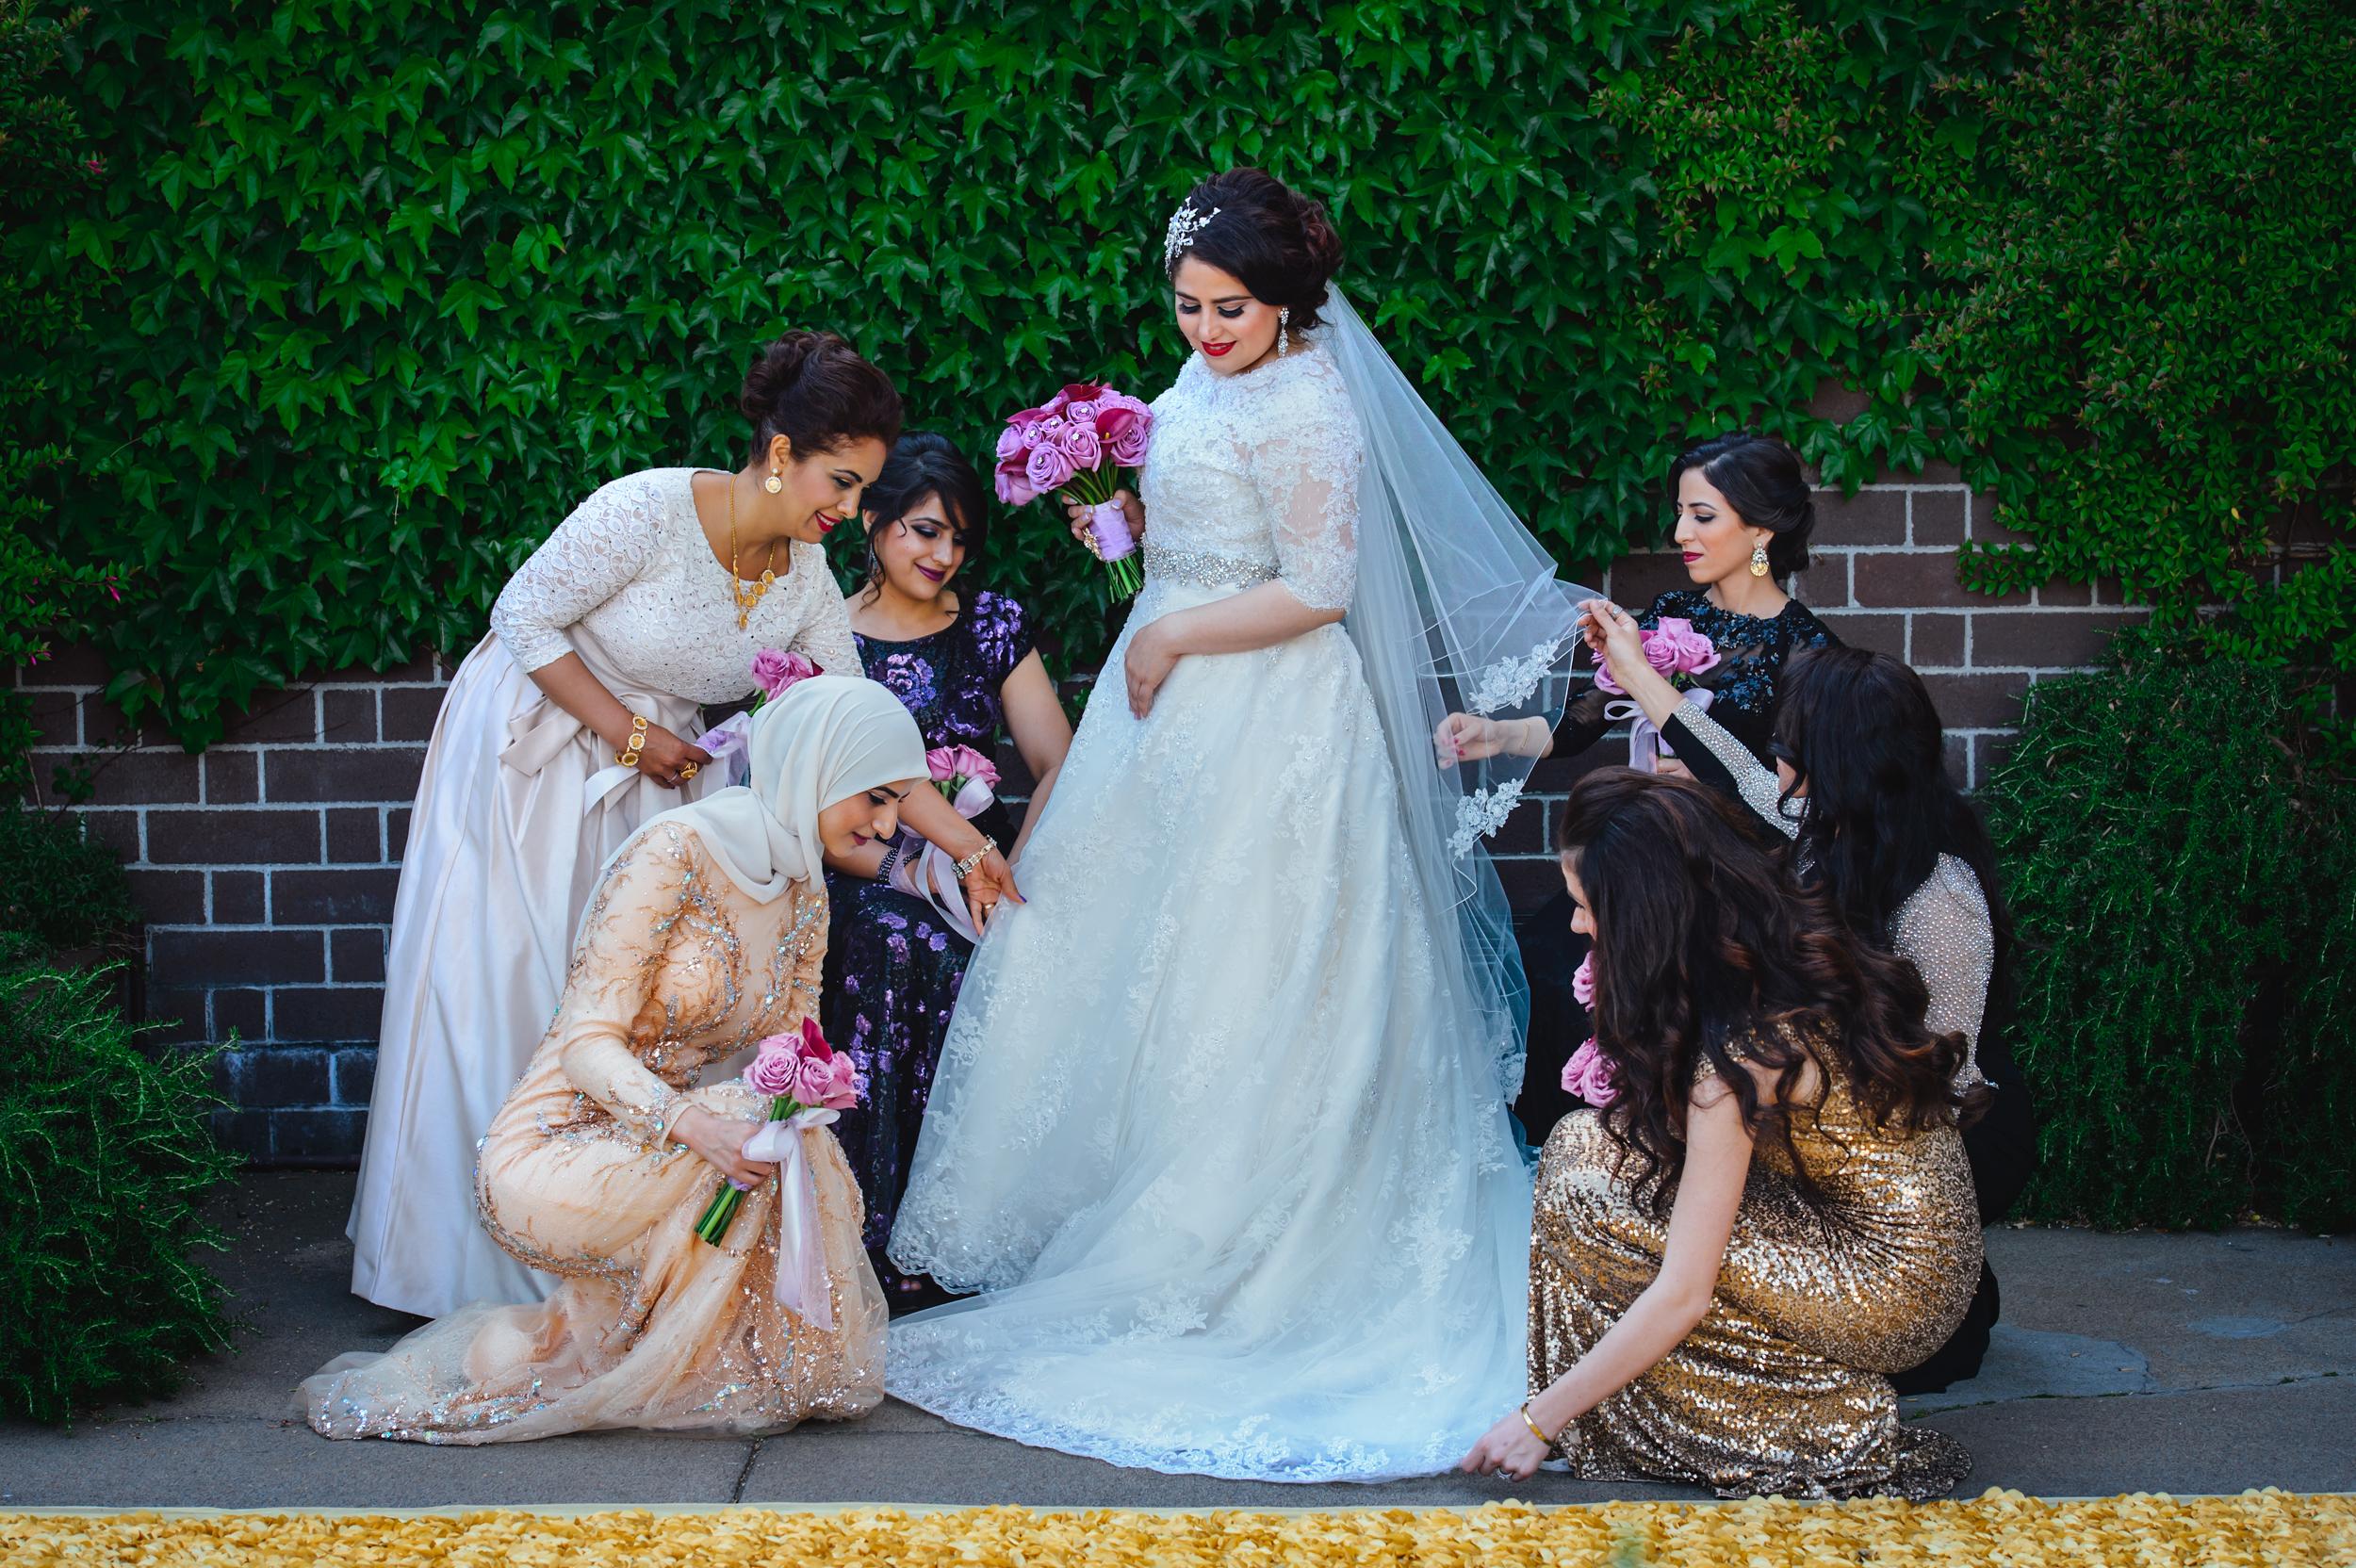 bride with her bridesmaids Fairmont San Francisco